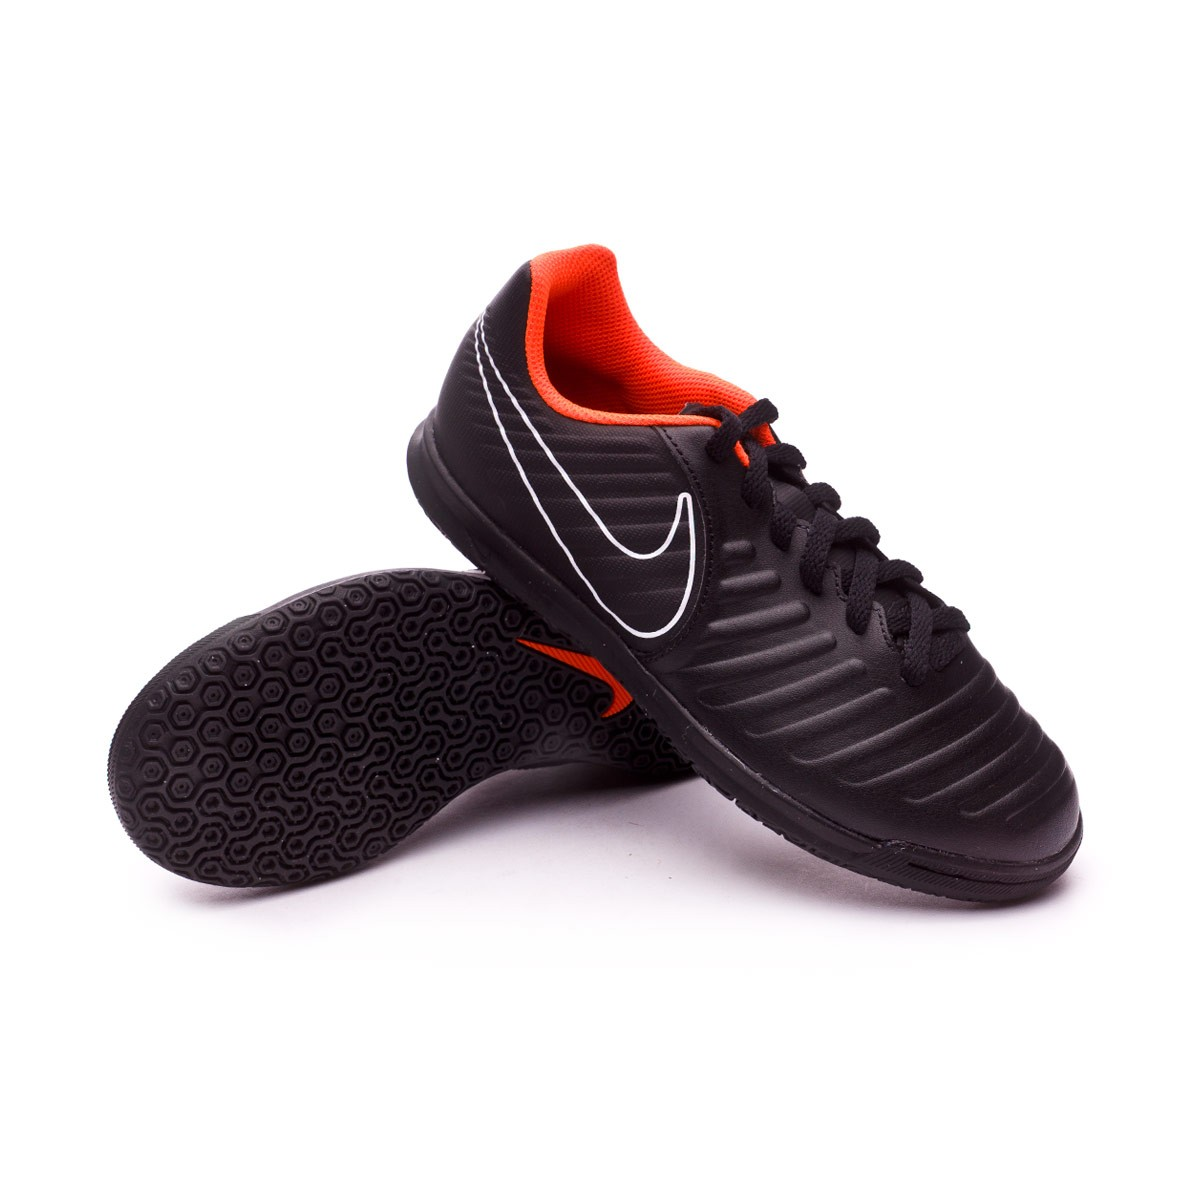 3d52c6d0f Nike Kids Tiempo LegendX VII Club IC Futsal Boot. Black-Total orange-White  ...